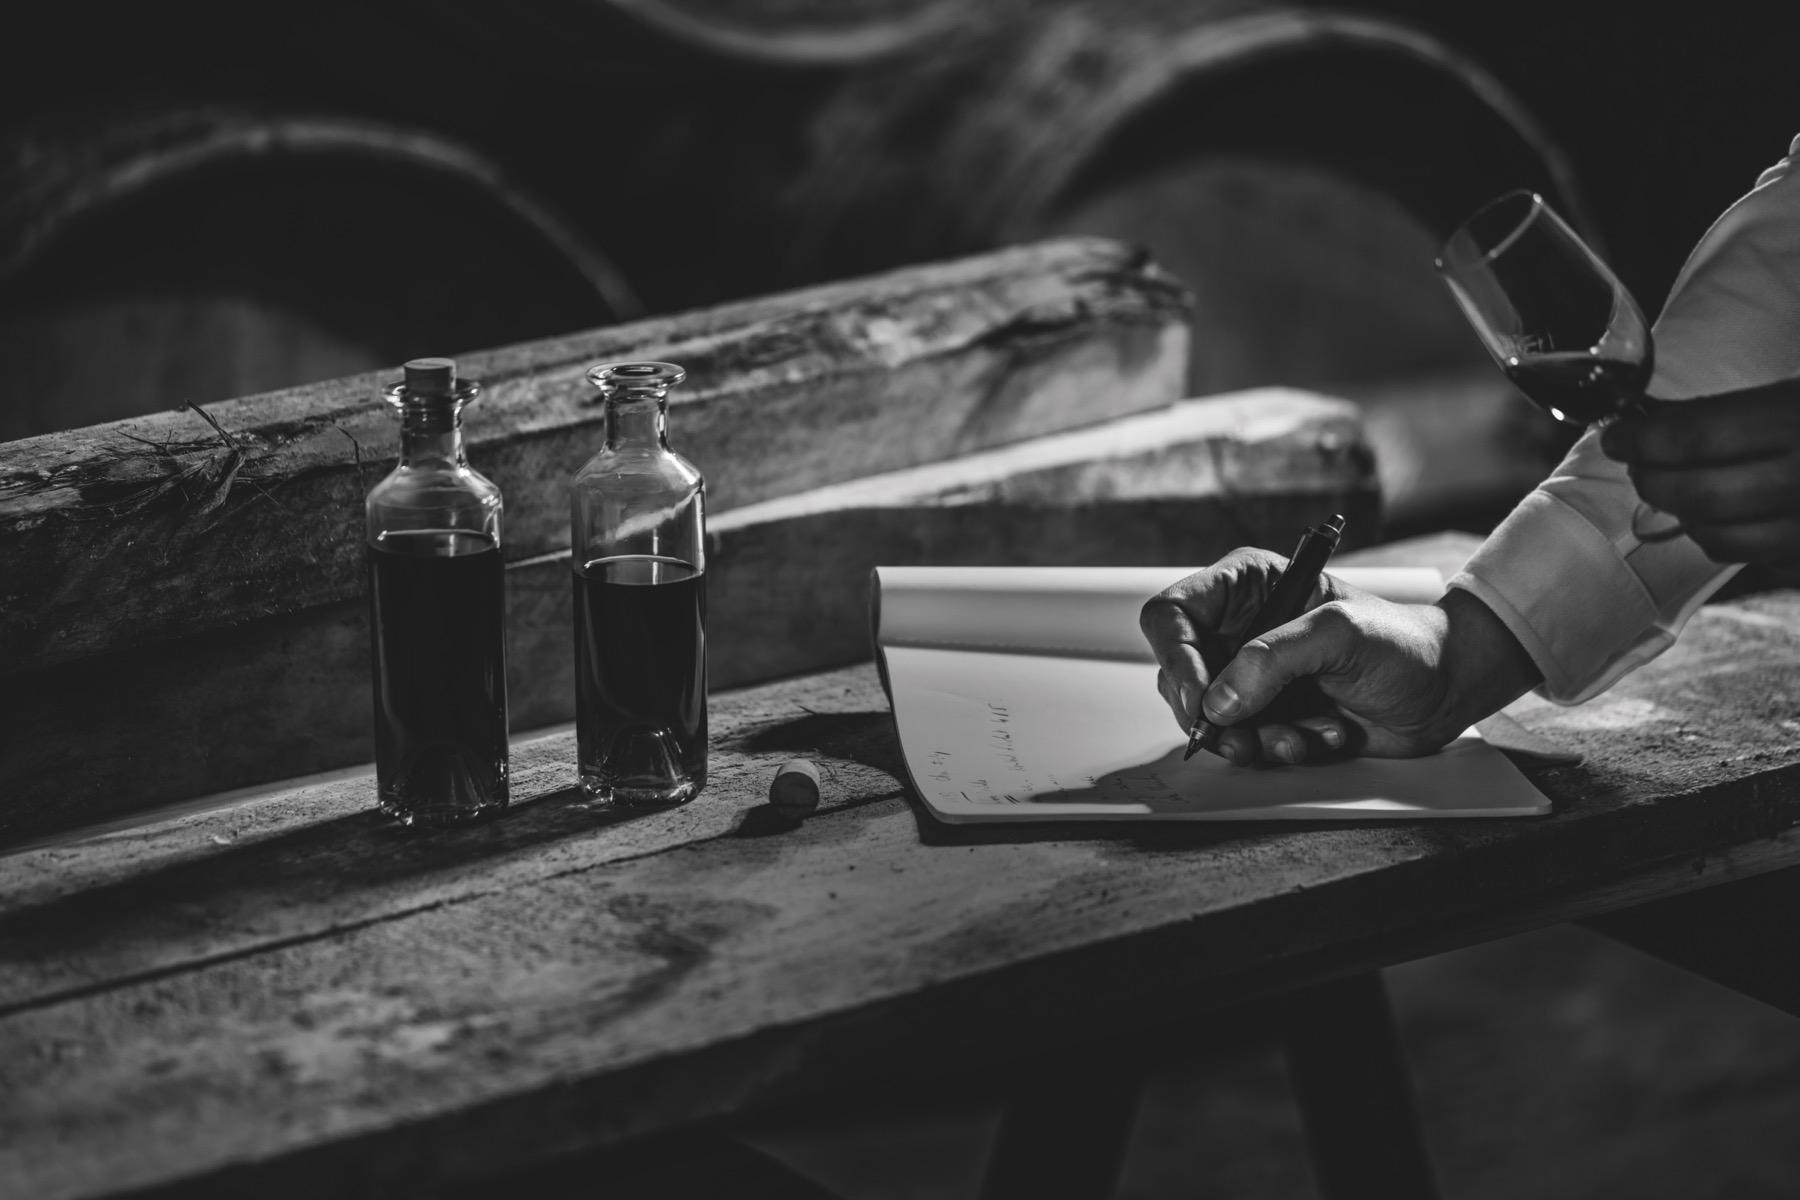 Батист Луазо — мастер погреба дома Rémy Martin мастер купажа роспись подпись эксклюзив